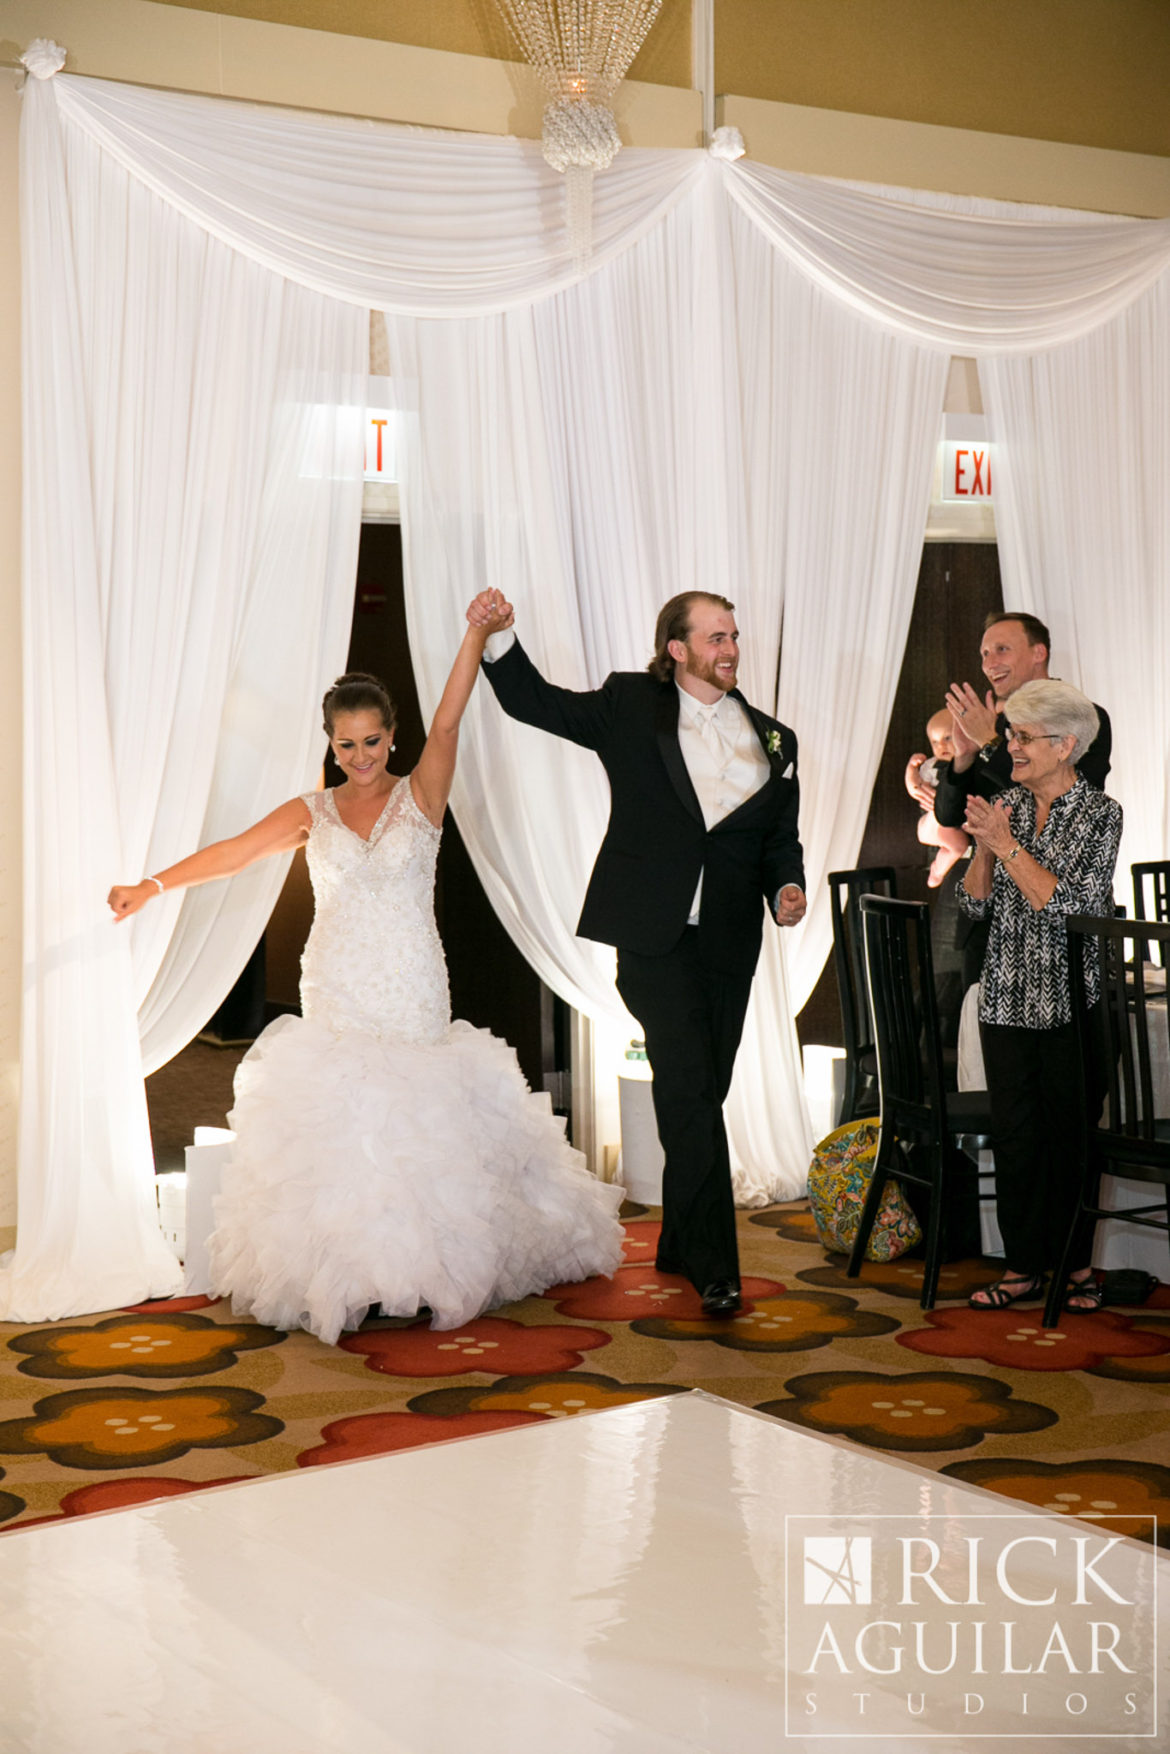 Elegant_Event_Lighting_Chicago_Hotel_Palomar_Wedding_Entrance_Draping_White